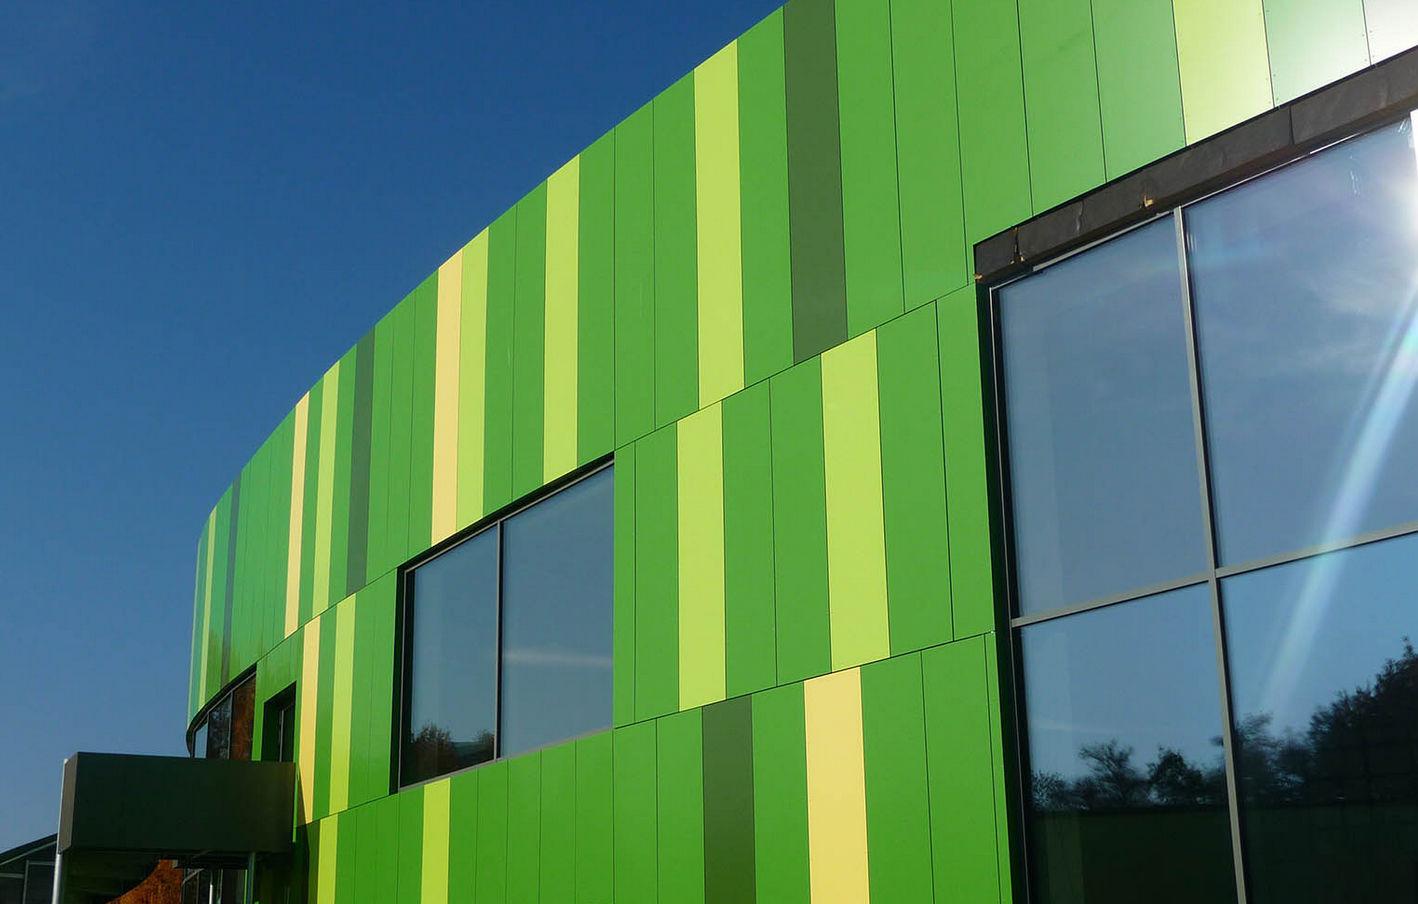 de fachada de material compuesto de aluminio liso de panel bambados